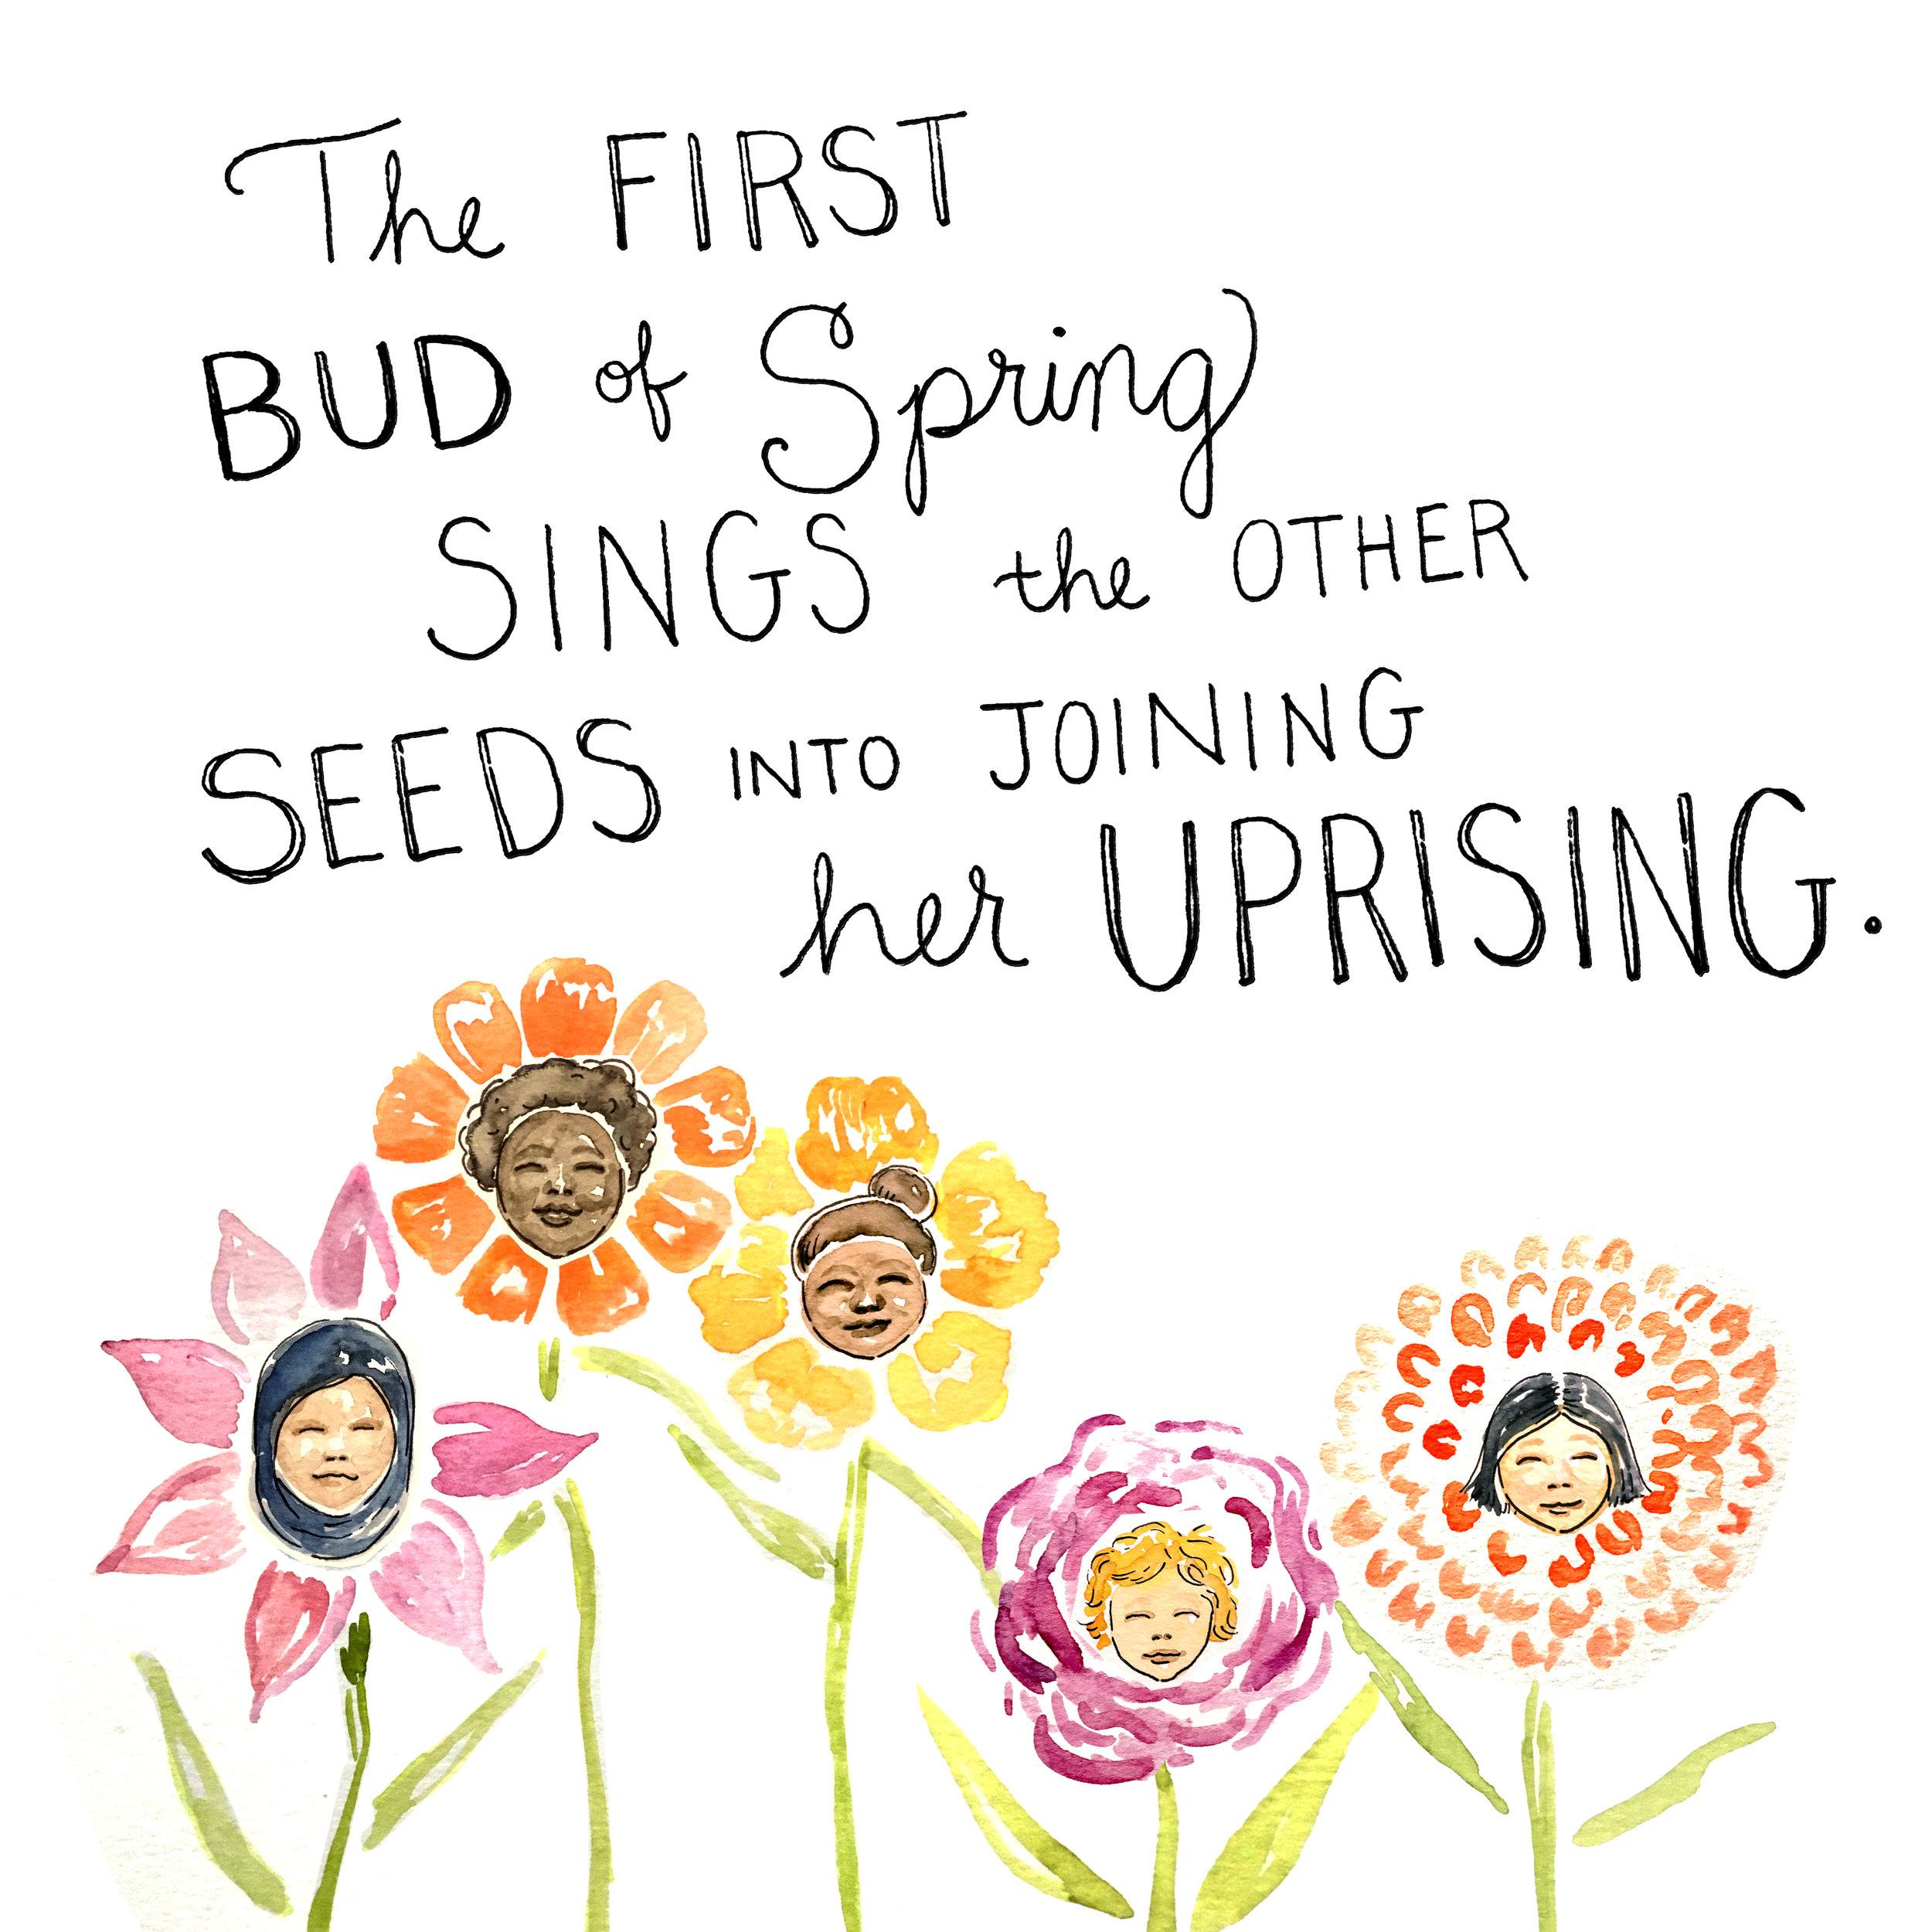 Illustrated by @KimothyJoy, words by @AmandaSCGorman